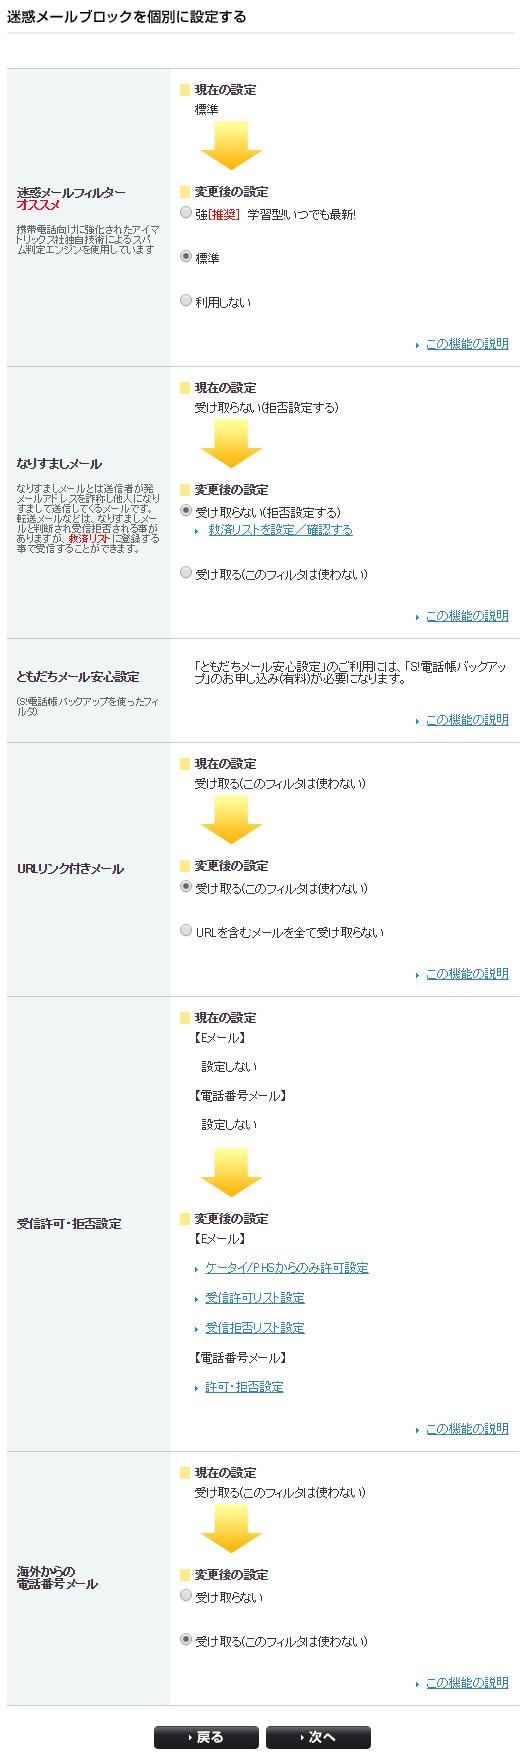 Softbankの迷惑メールフィルタ「個別設定」を利用する